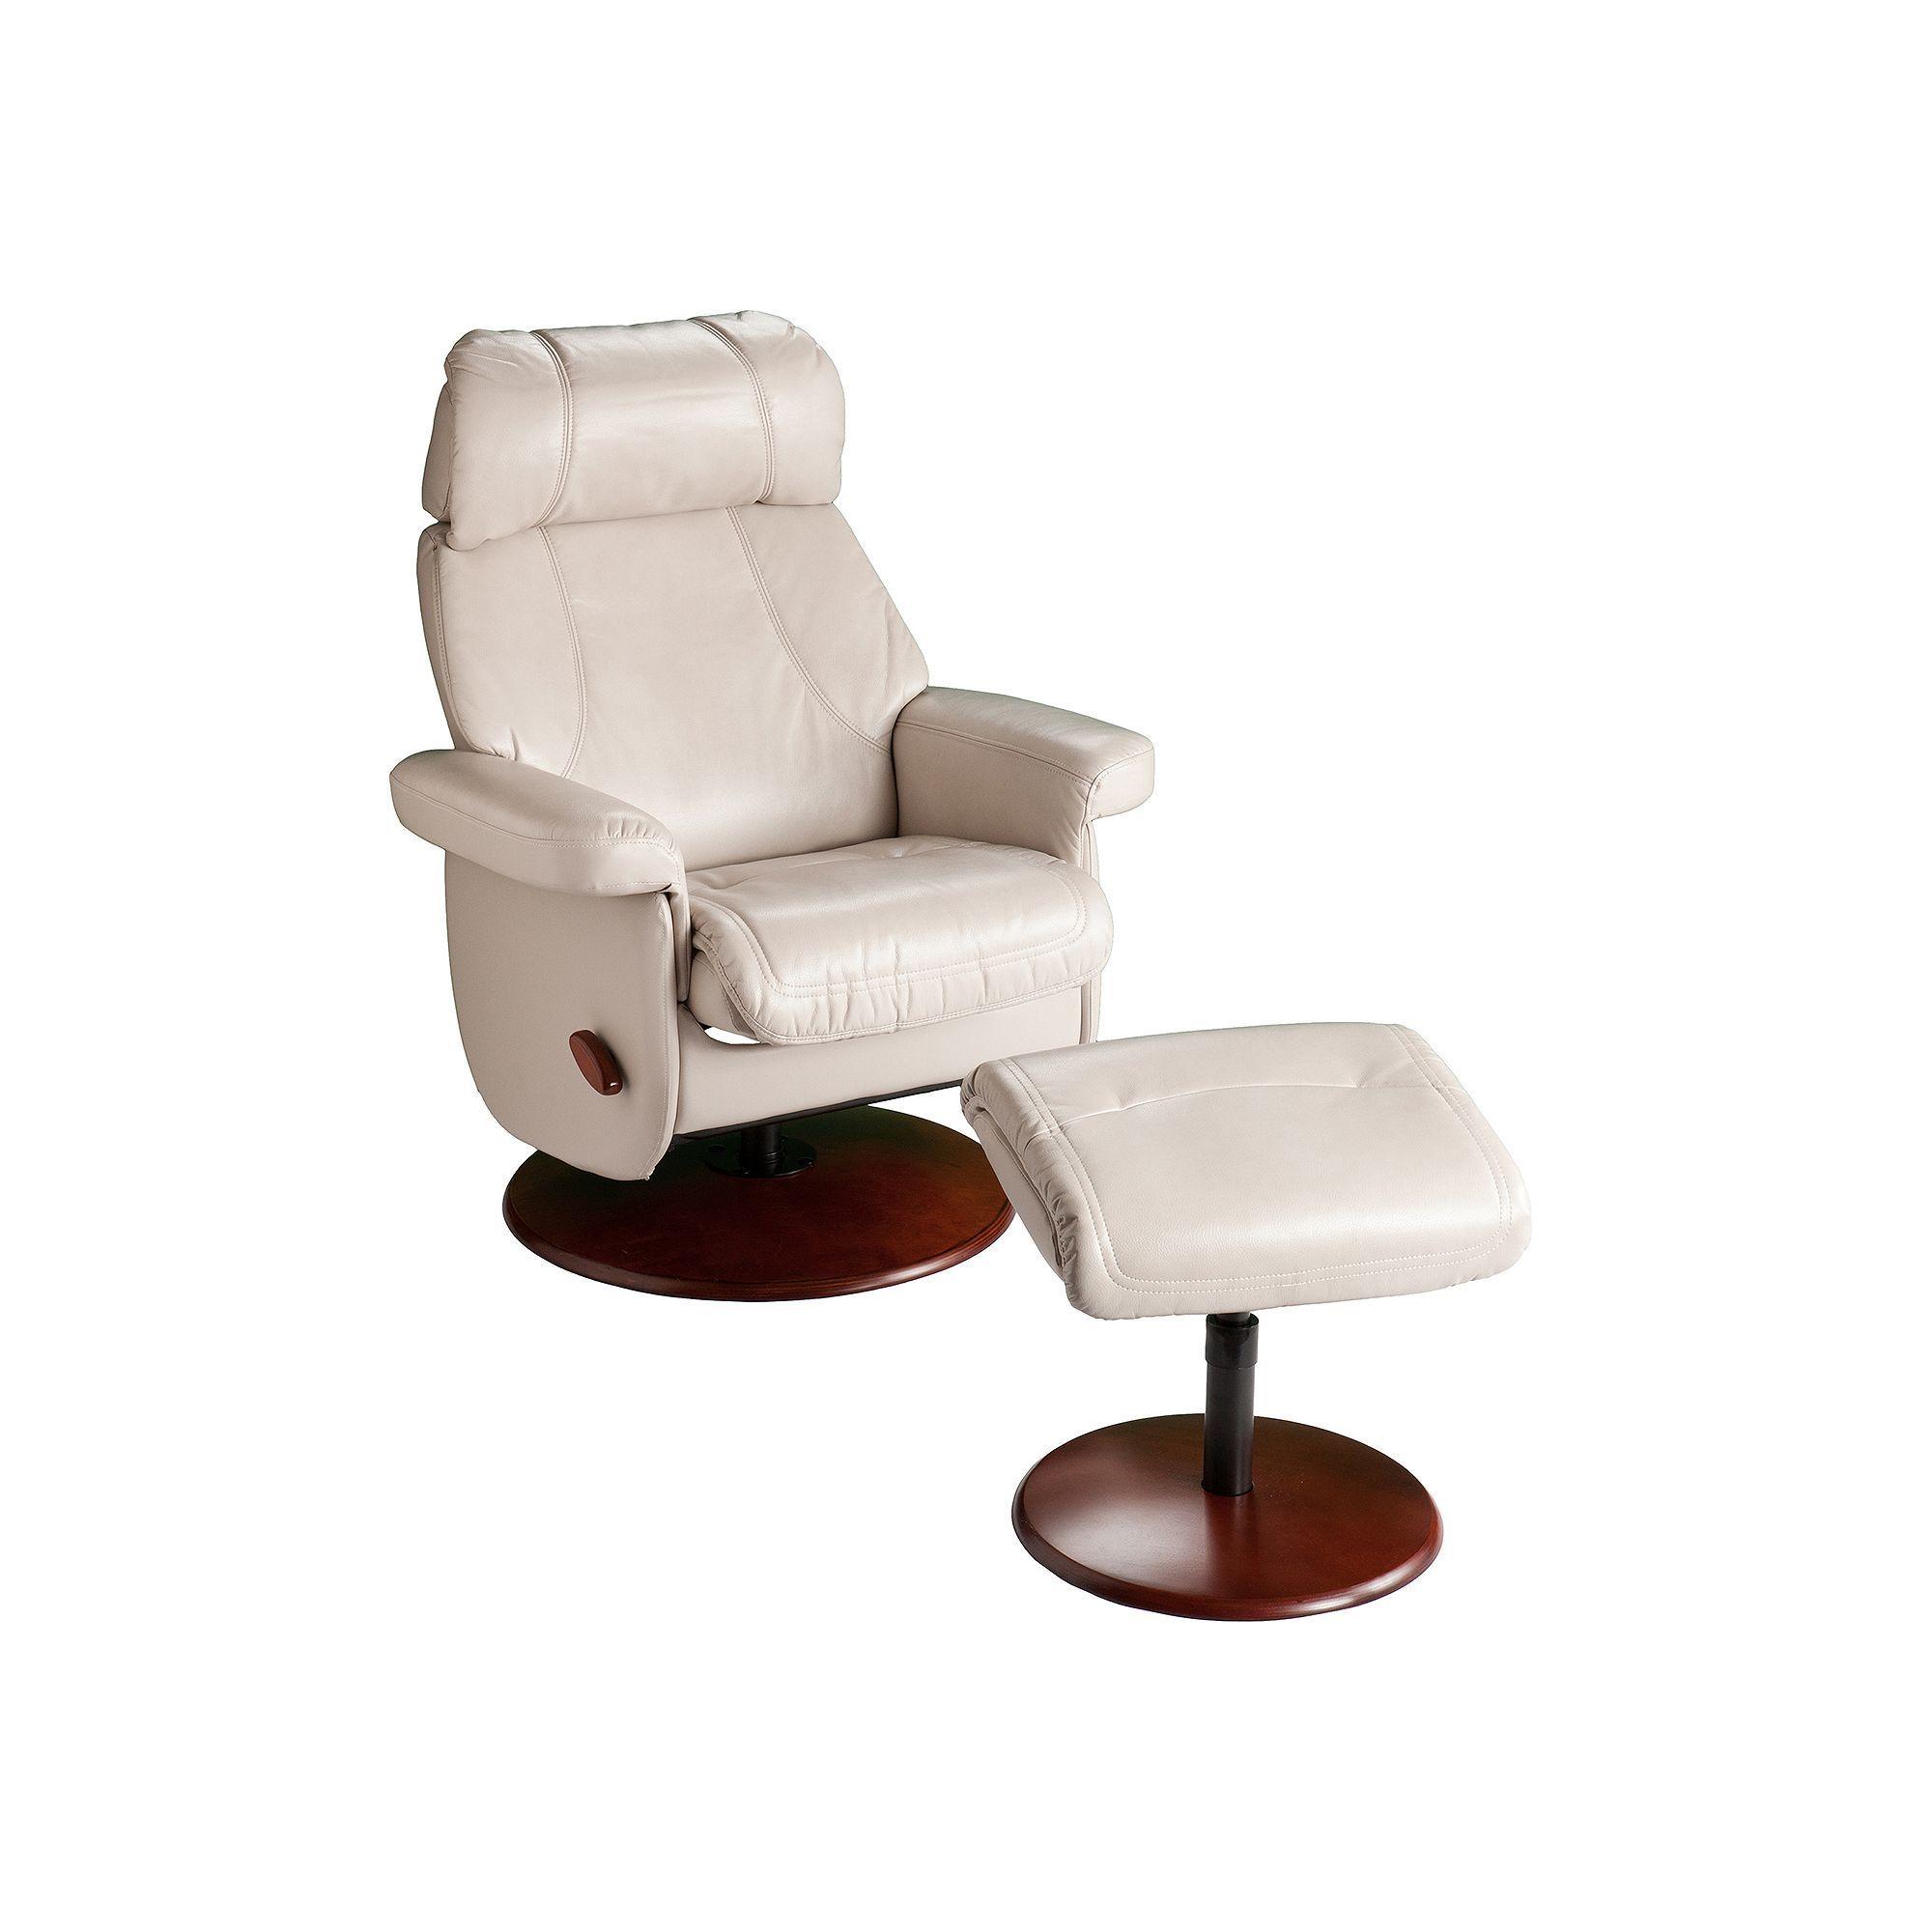 swivel glider rocker recliner chair u0026 ottoman 2piece set black